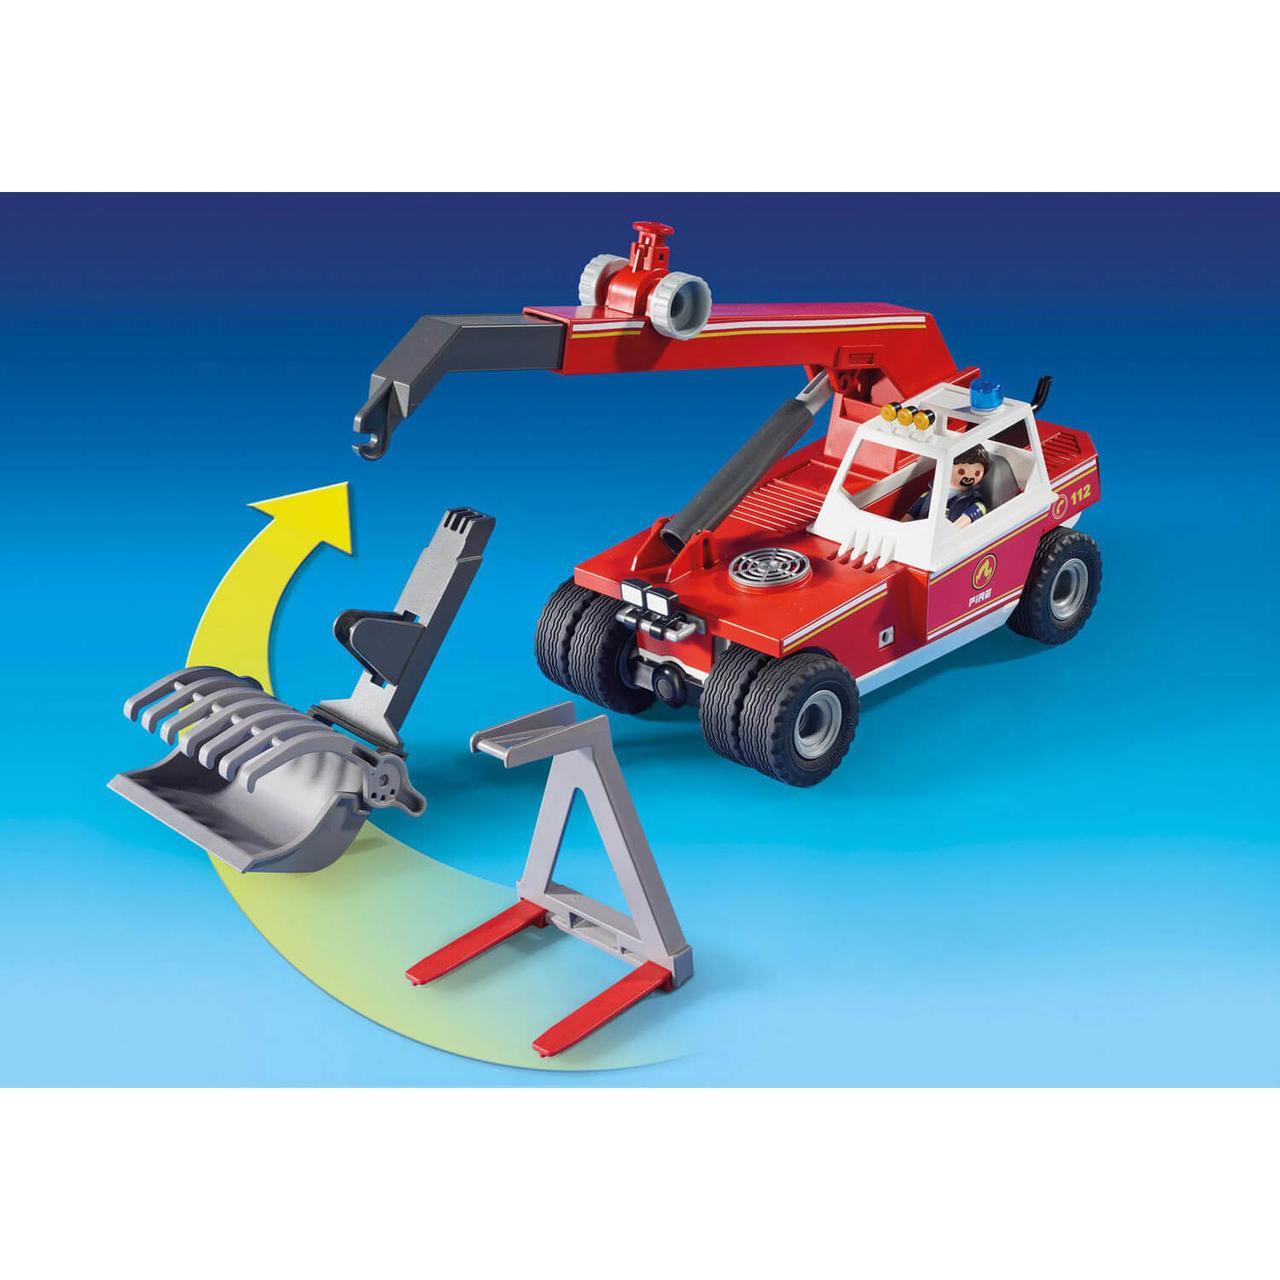 Конструктор Playmobil Пожарная служба: Пожарный Кран 9465pm - фото 3